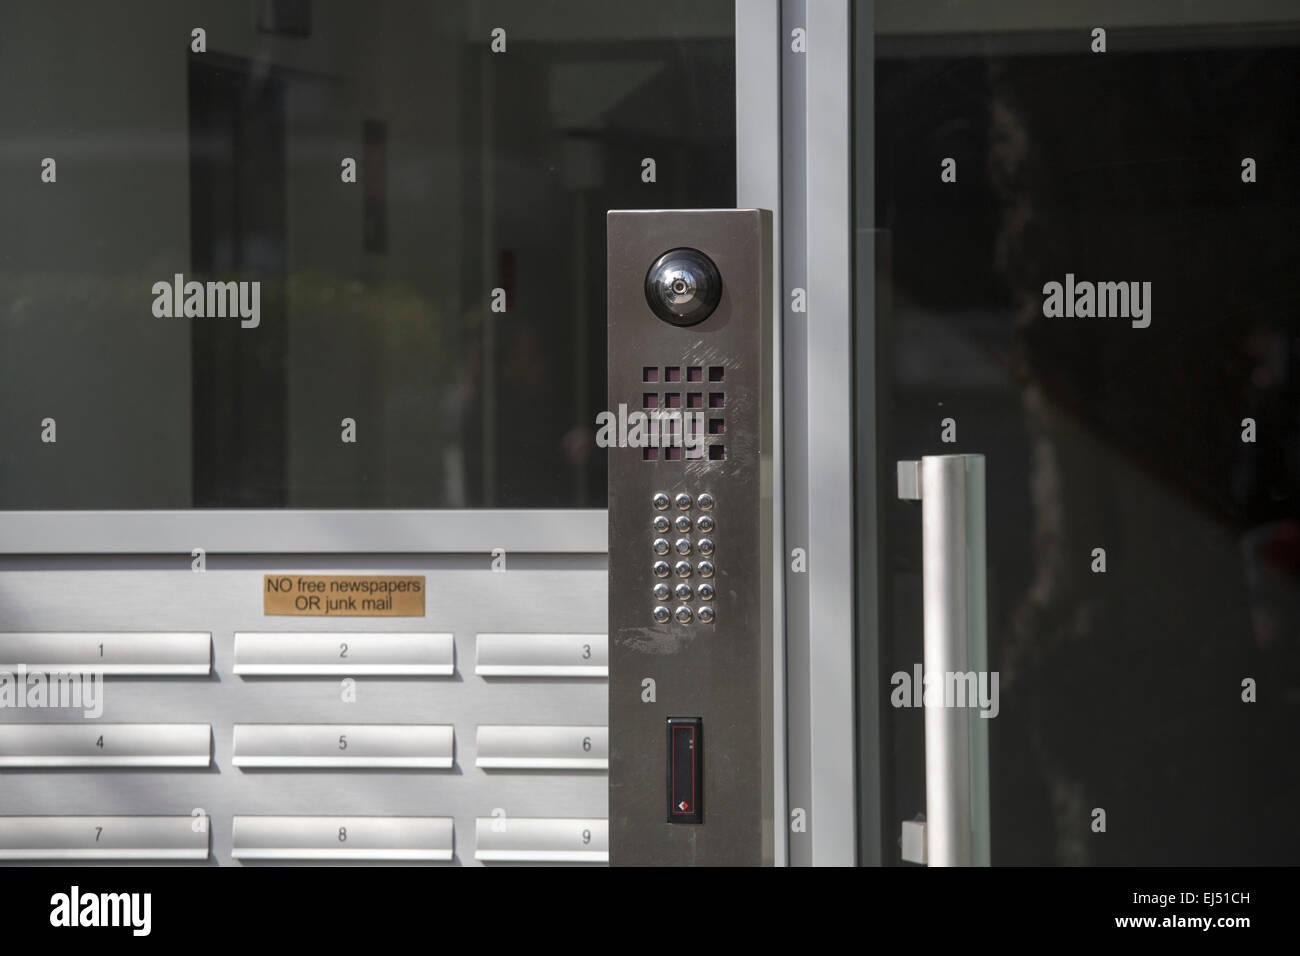 Eingang Summer Gegensprechanlage Bell Tastatur Lautsprecher Kamera Stockbild